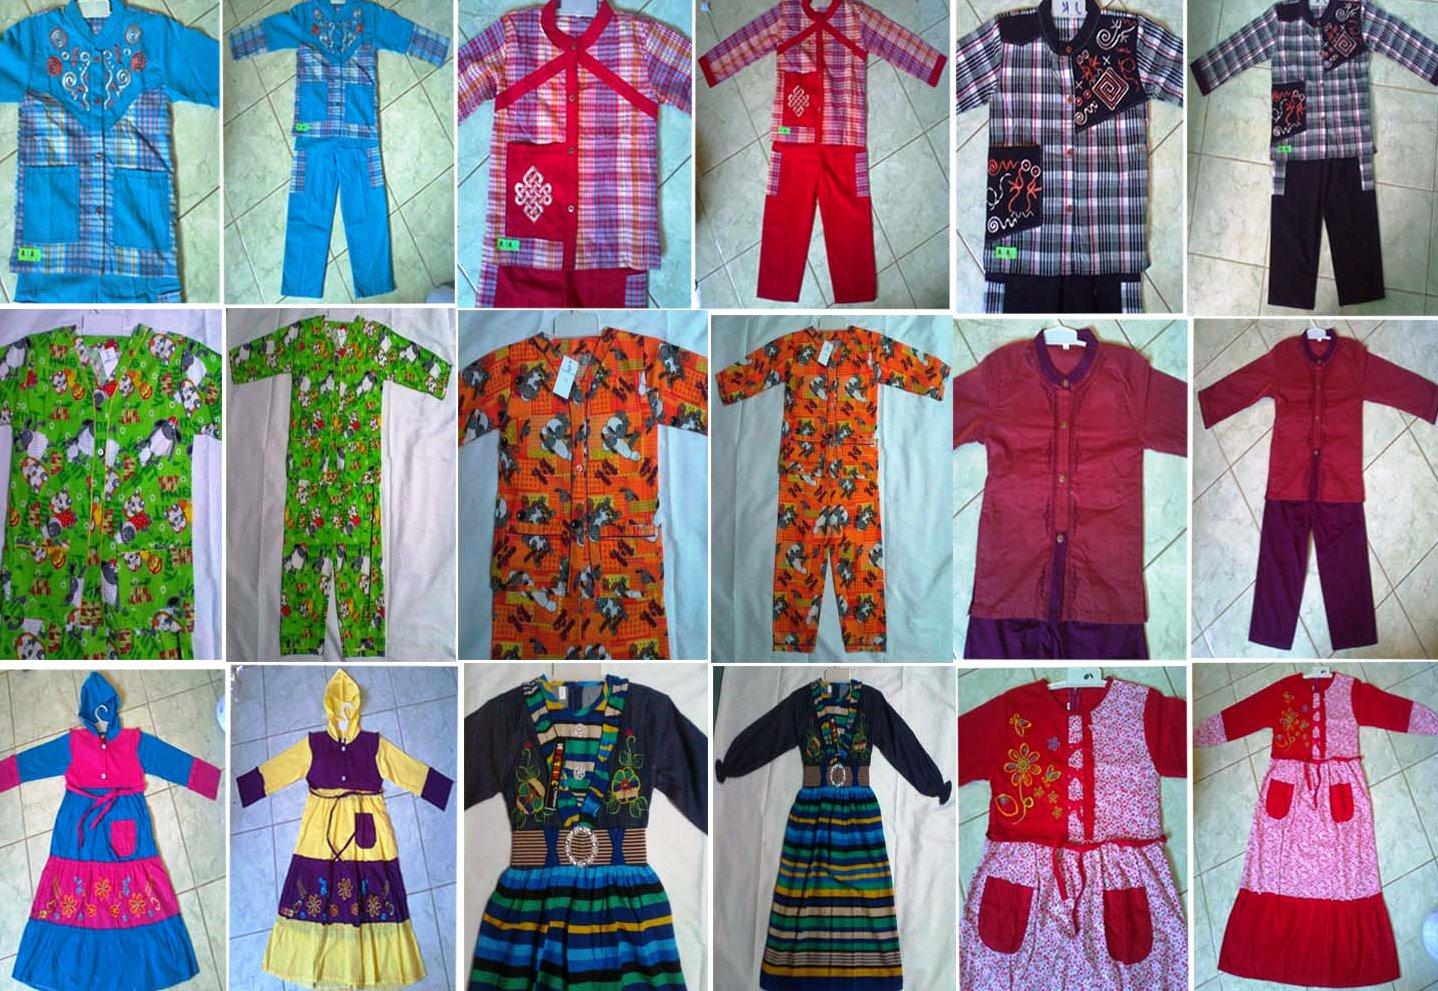 kulakan Baju Murah Meriah grosir baju anak branded,Baju Anak Anak Harga 5000